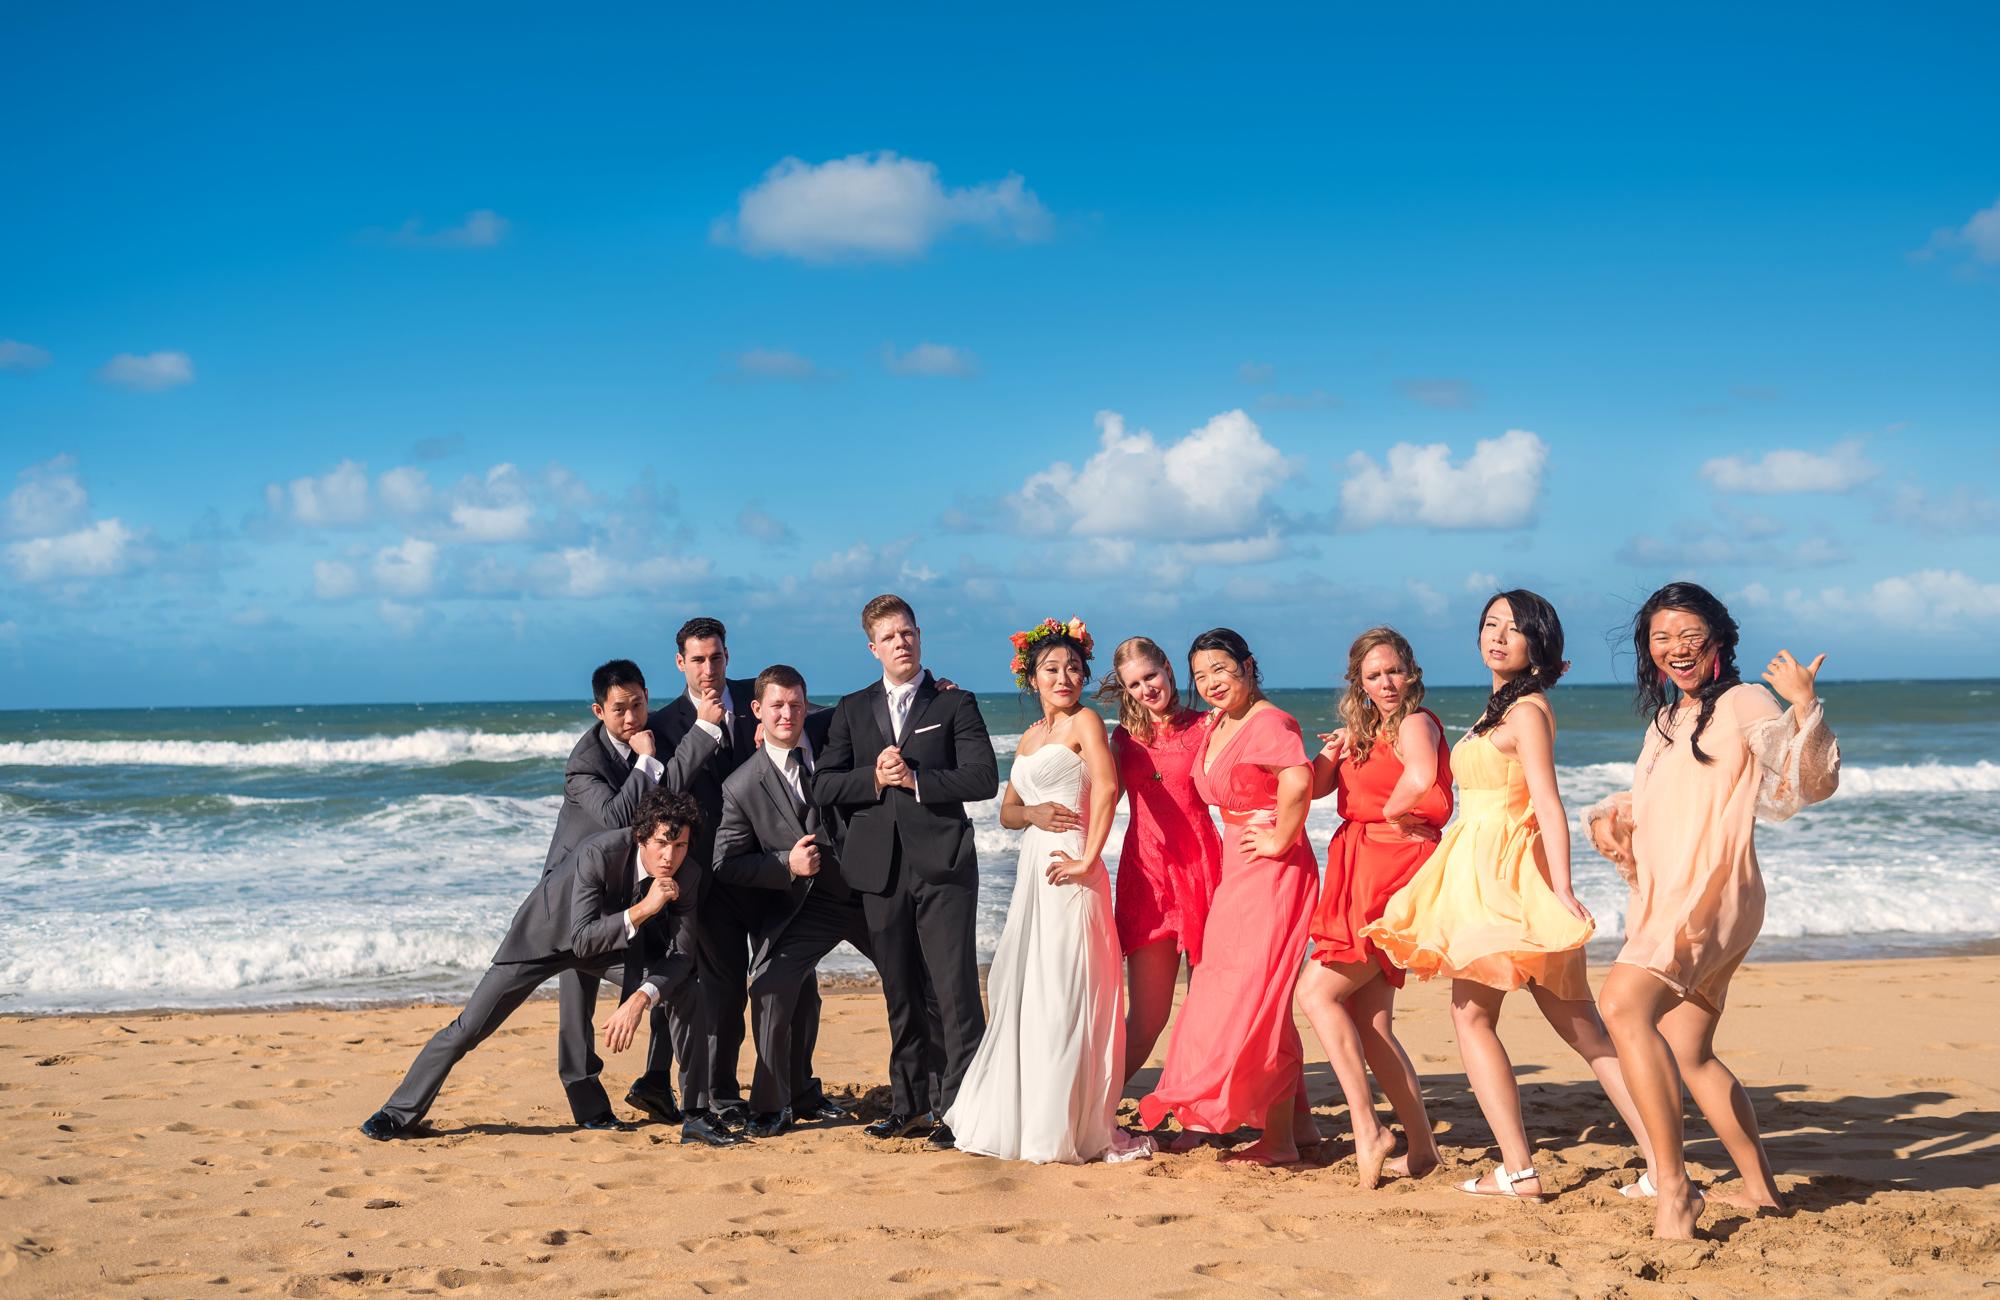 Yifan_Zhang_Geoff_Oberhofer_Carlin_Ma_wedding-0976.jpg